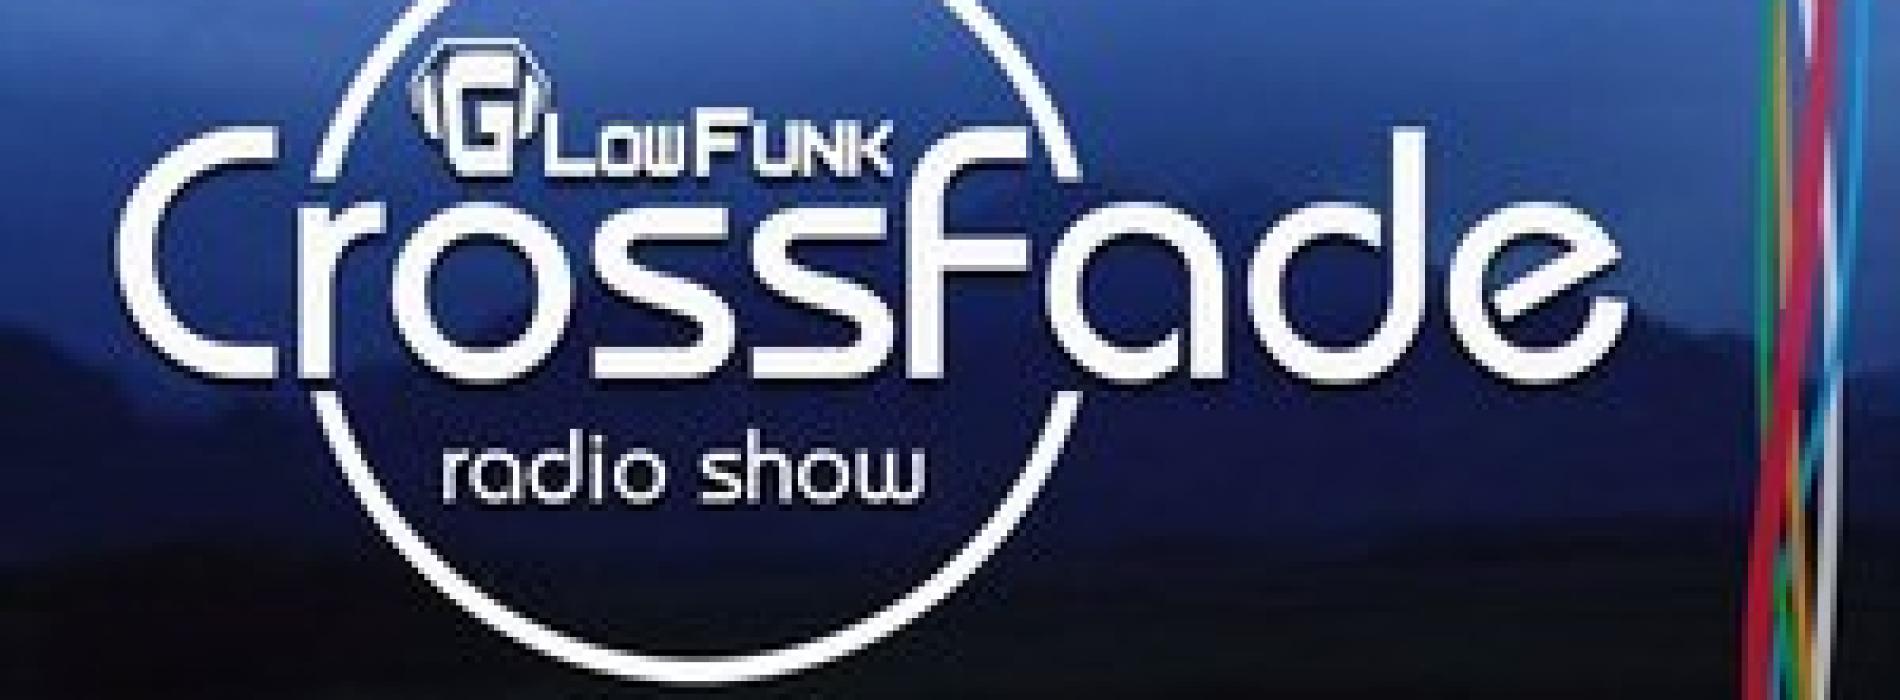 Glowfunk : Crossfade Radio Show #004